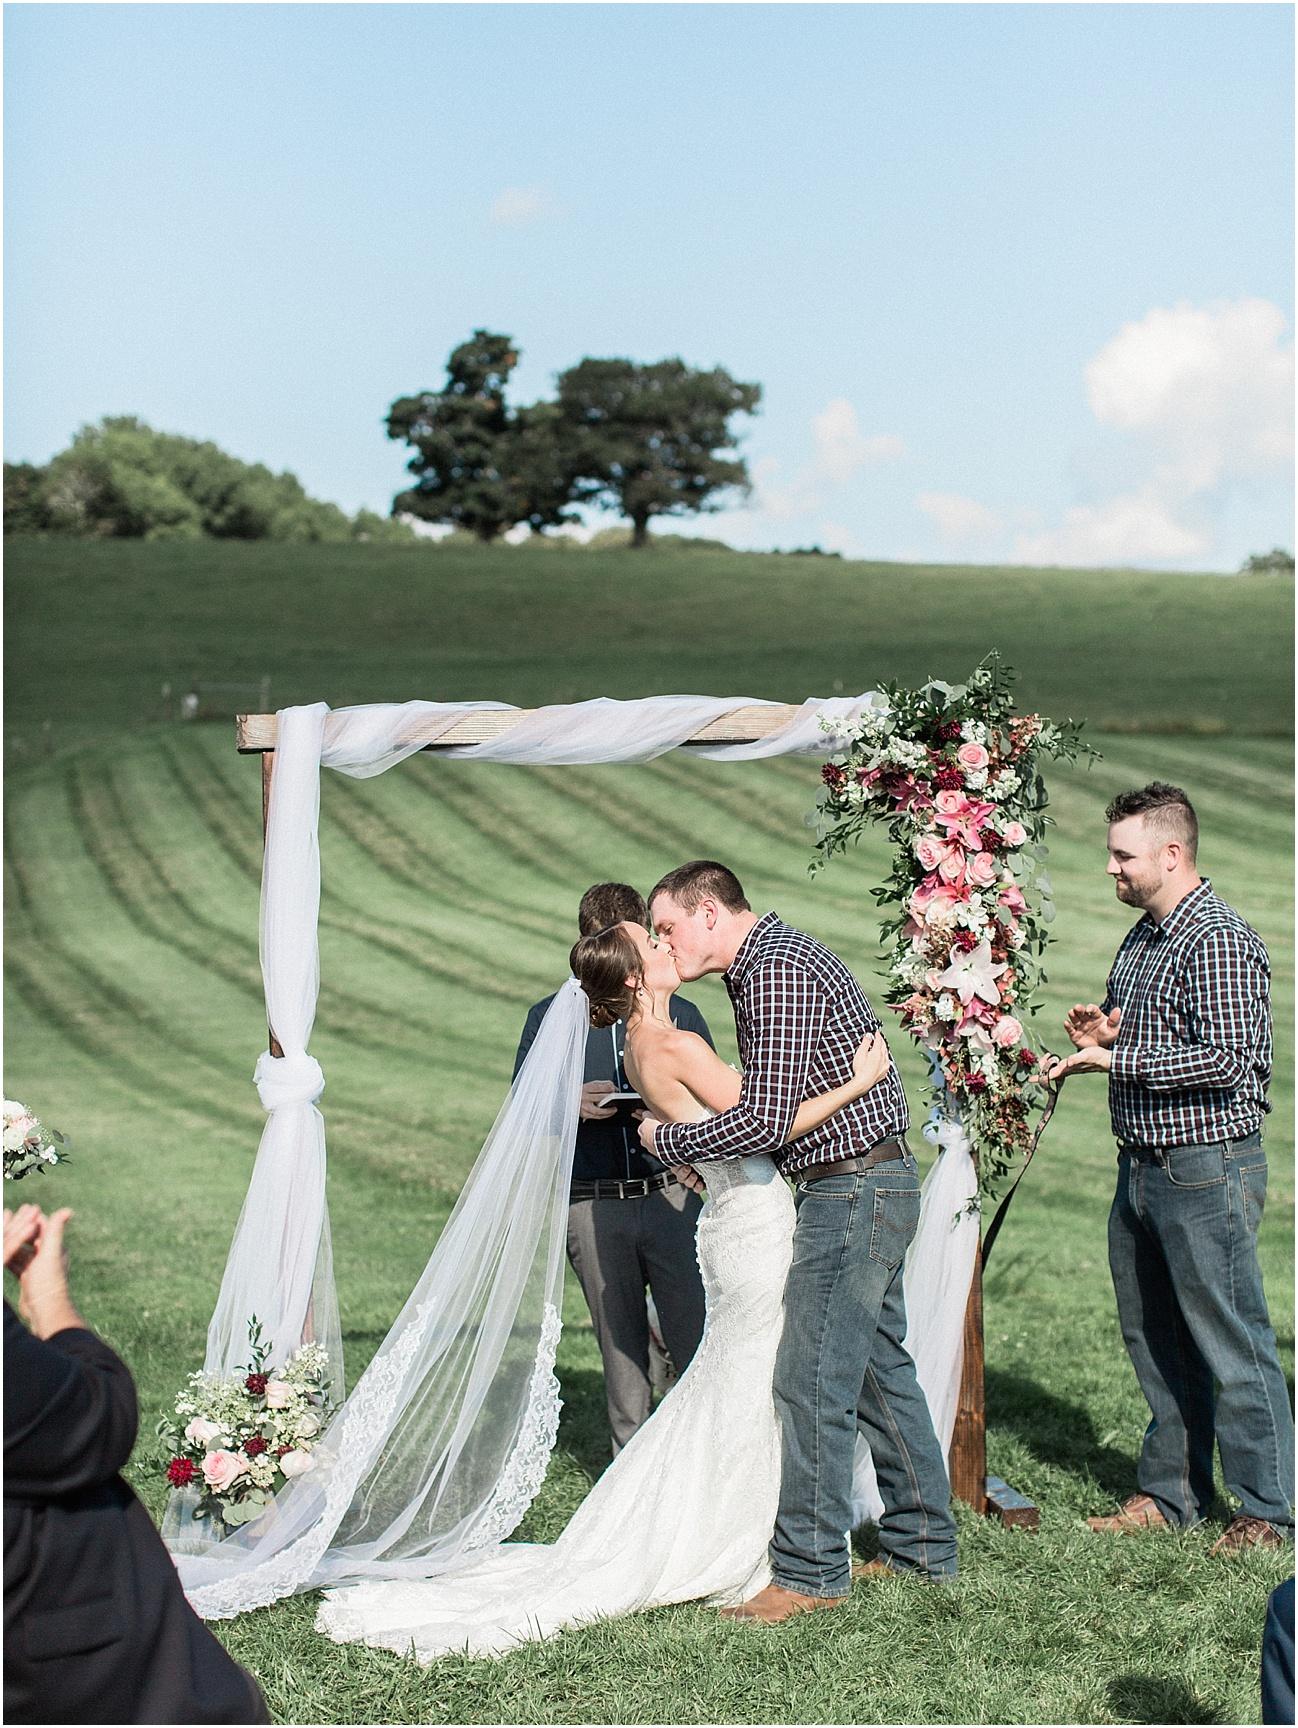 jackie_brad_barn_at_gibbett_hill_country_yellow_lab_fall_burgundy_cape_cod_boston_wedding_photographer_meredith_jane_photography_photo_1034.jpg